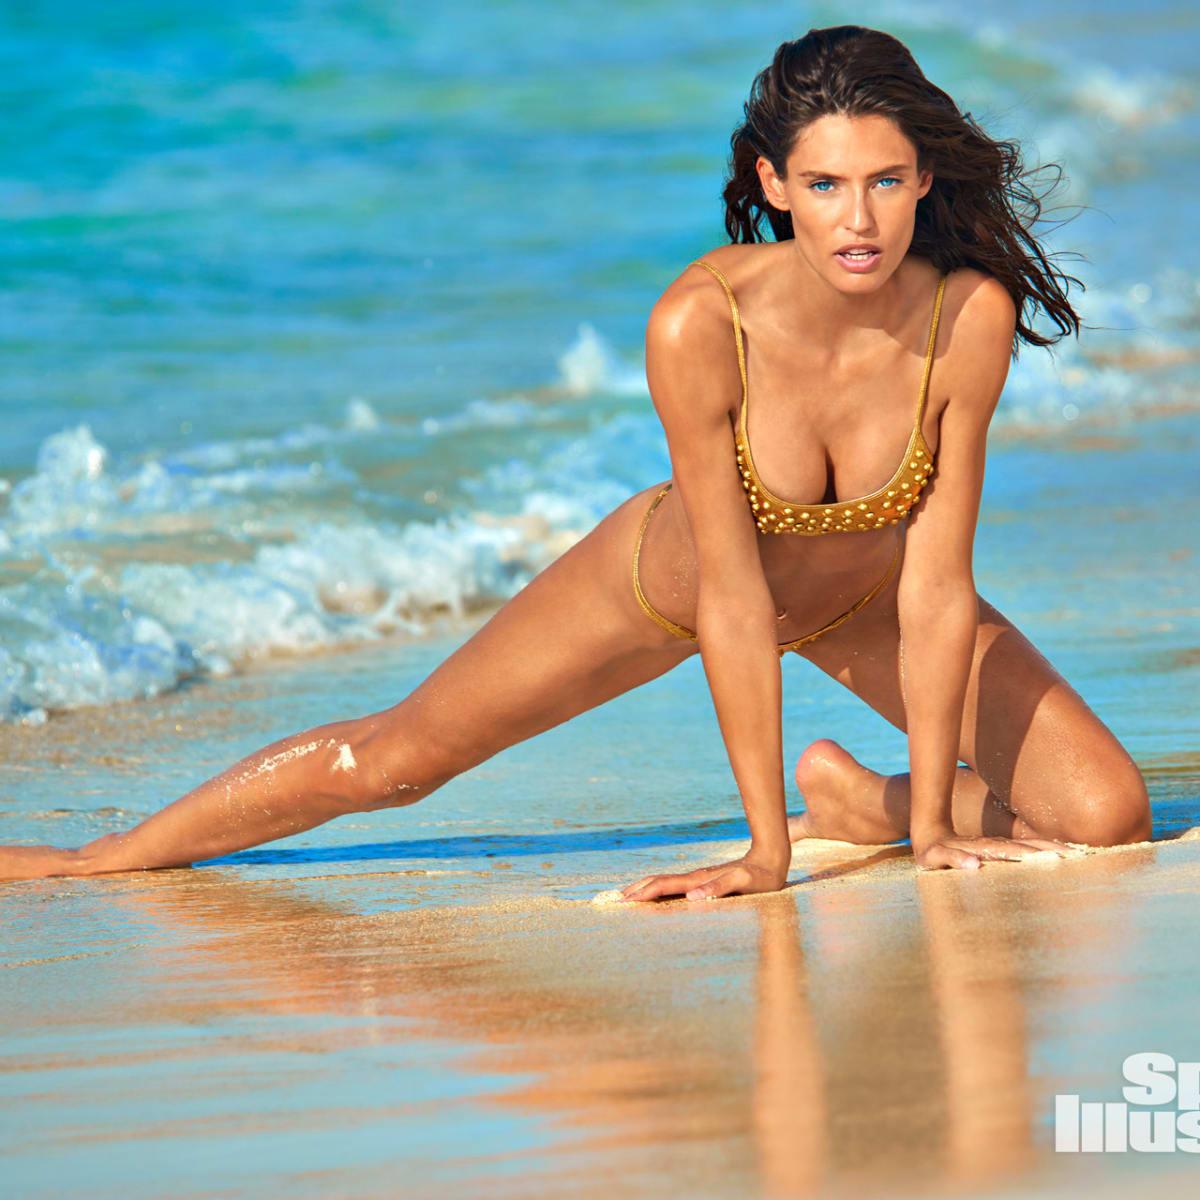 Bianca Balti Photos, Sports Illustrated Swimsuit 2018 - Swimsuit | SI.com